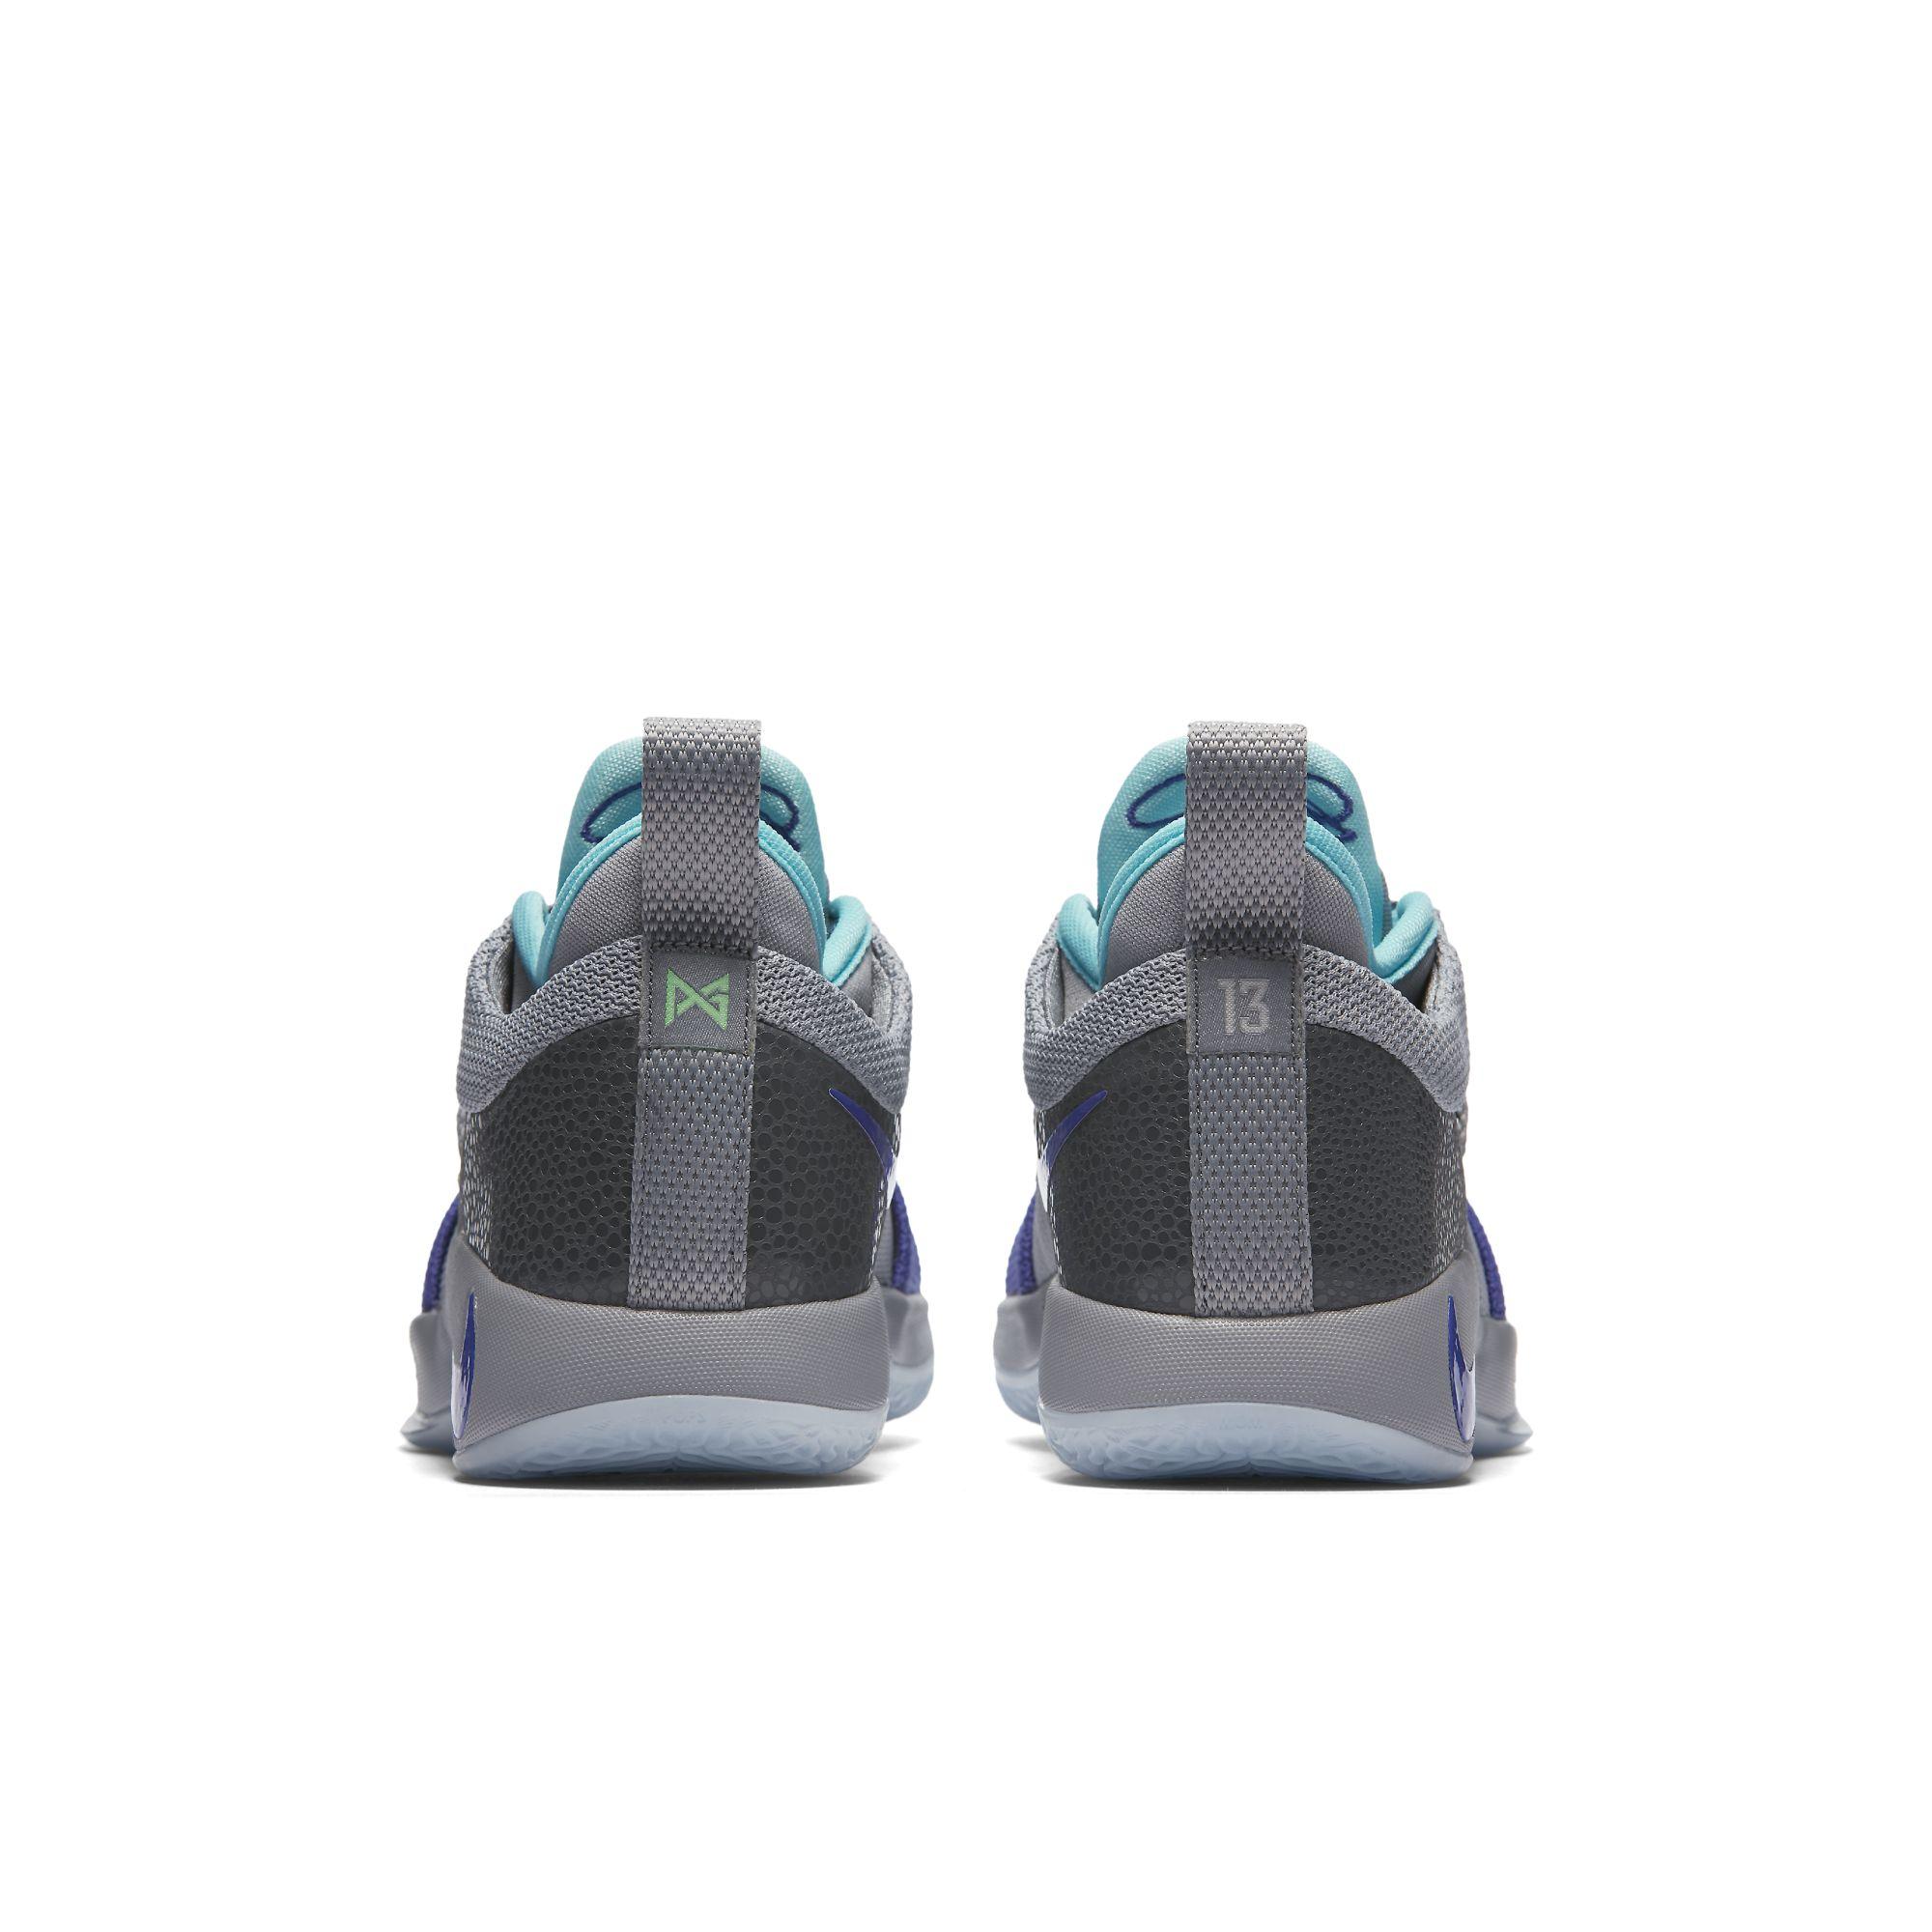 Nike PG 2 PURE PLATINUM GS 5